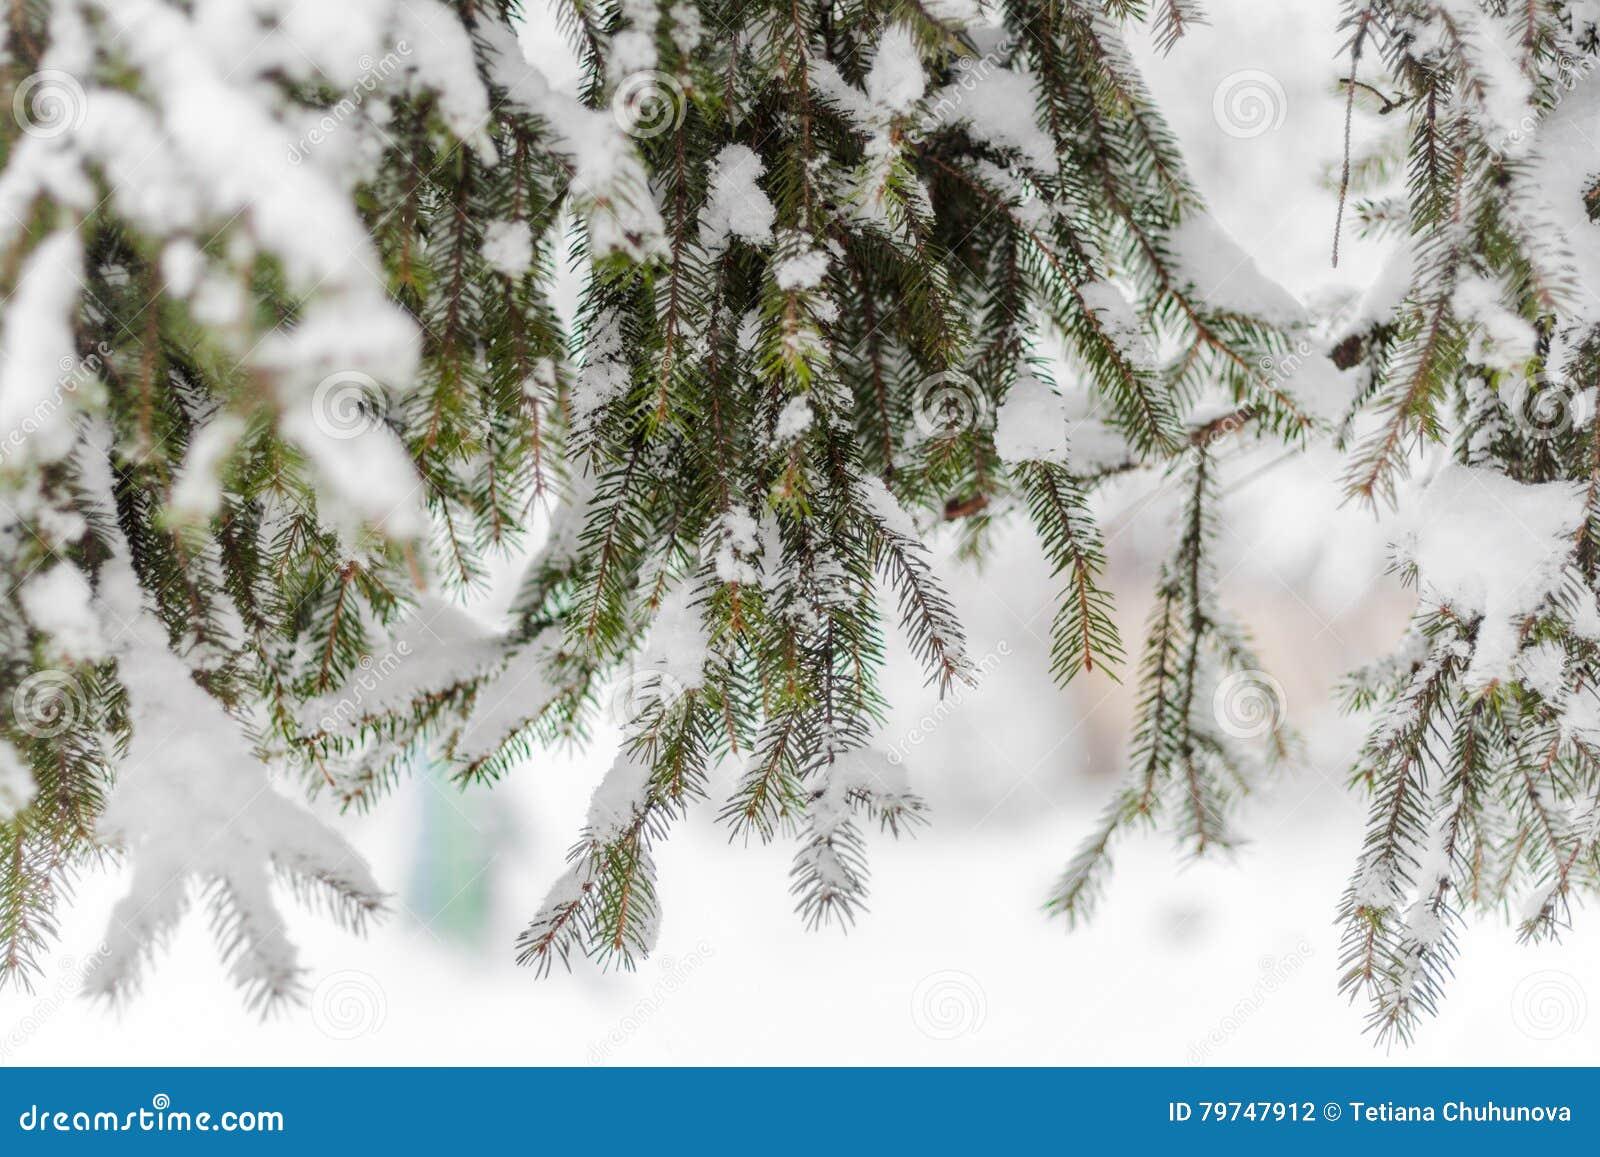 Abeto verde derramado con nieve gruesa